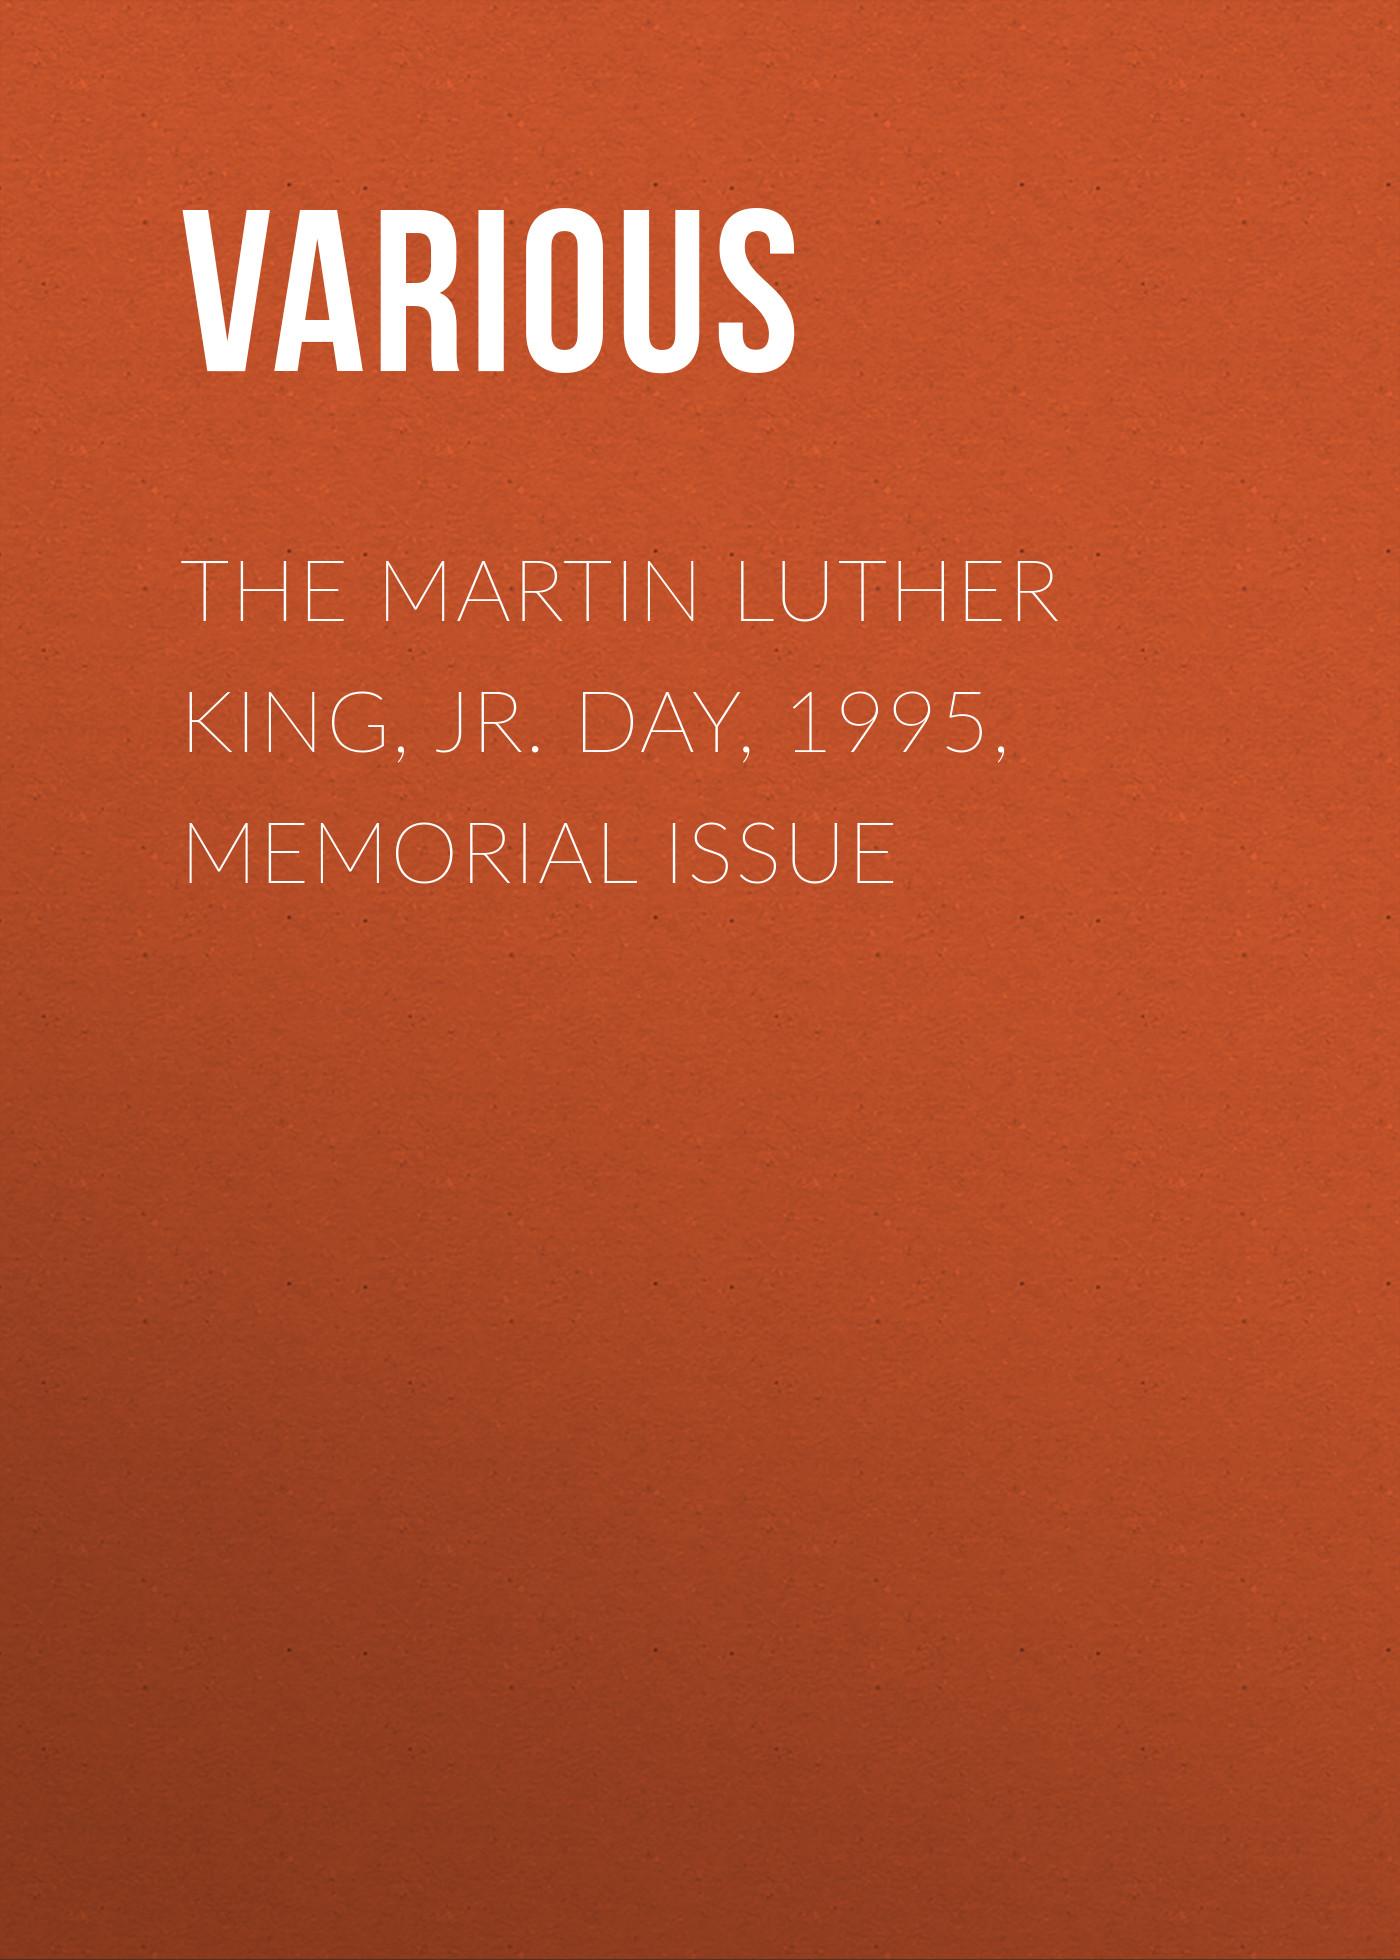 лучшая цена Various The Martin Luther King, Jr. Day, 1995, Memorial Issue